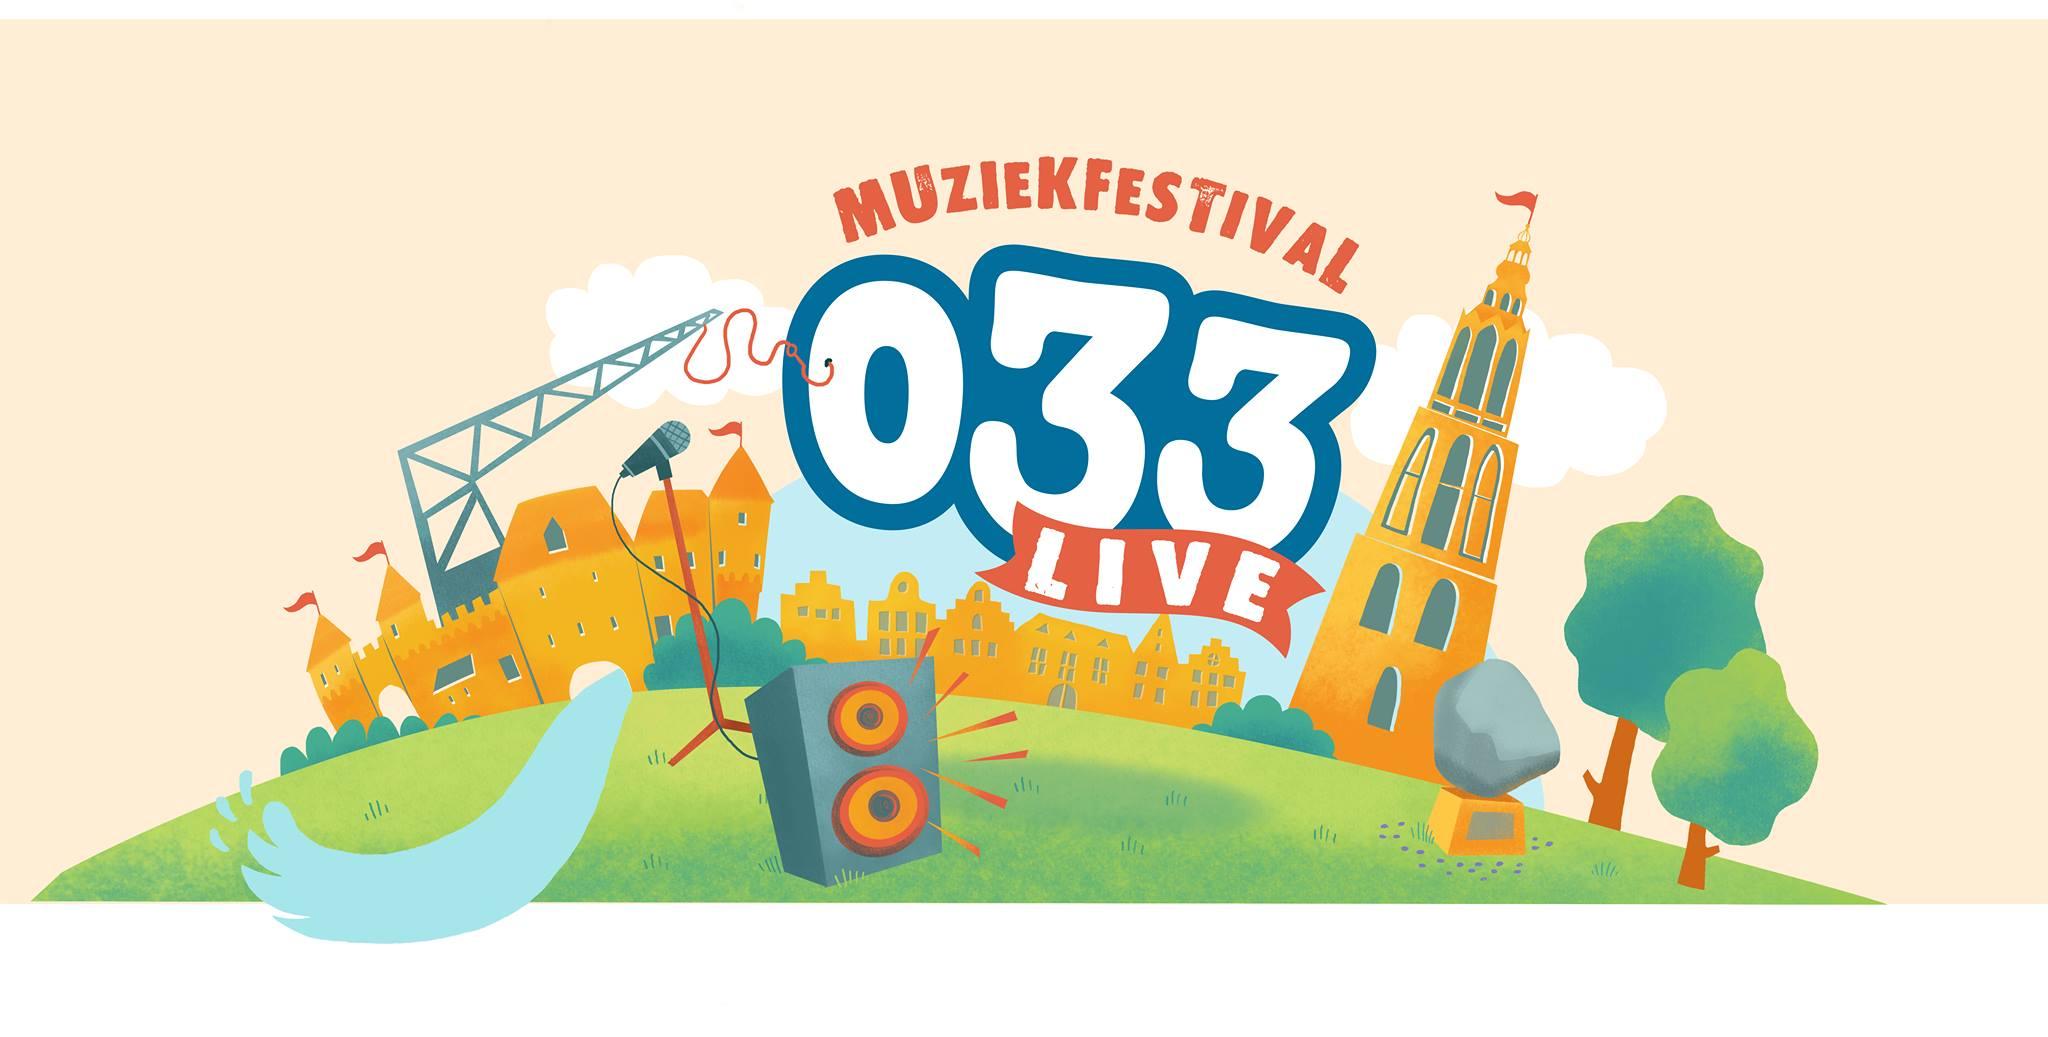 033Live @ Mijnbouwweg